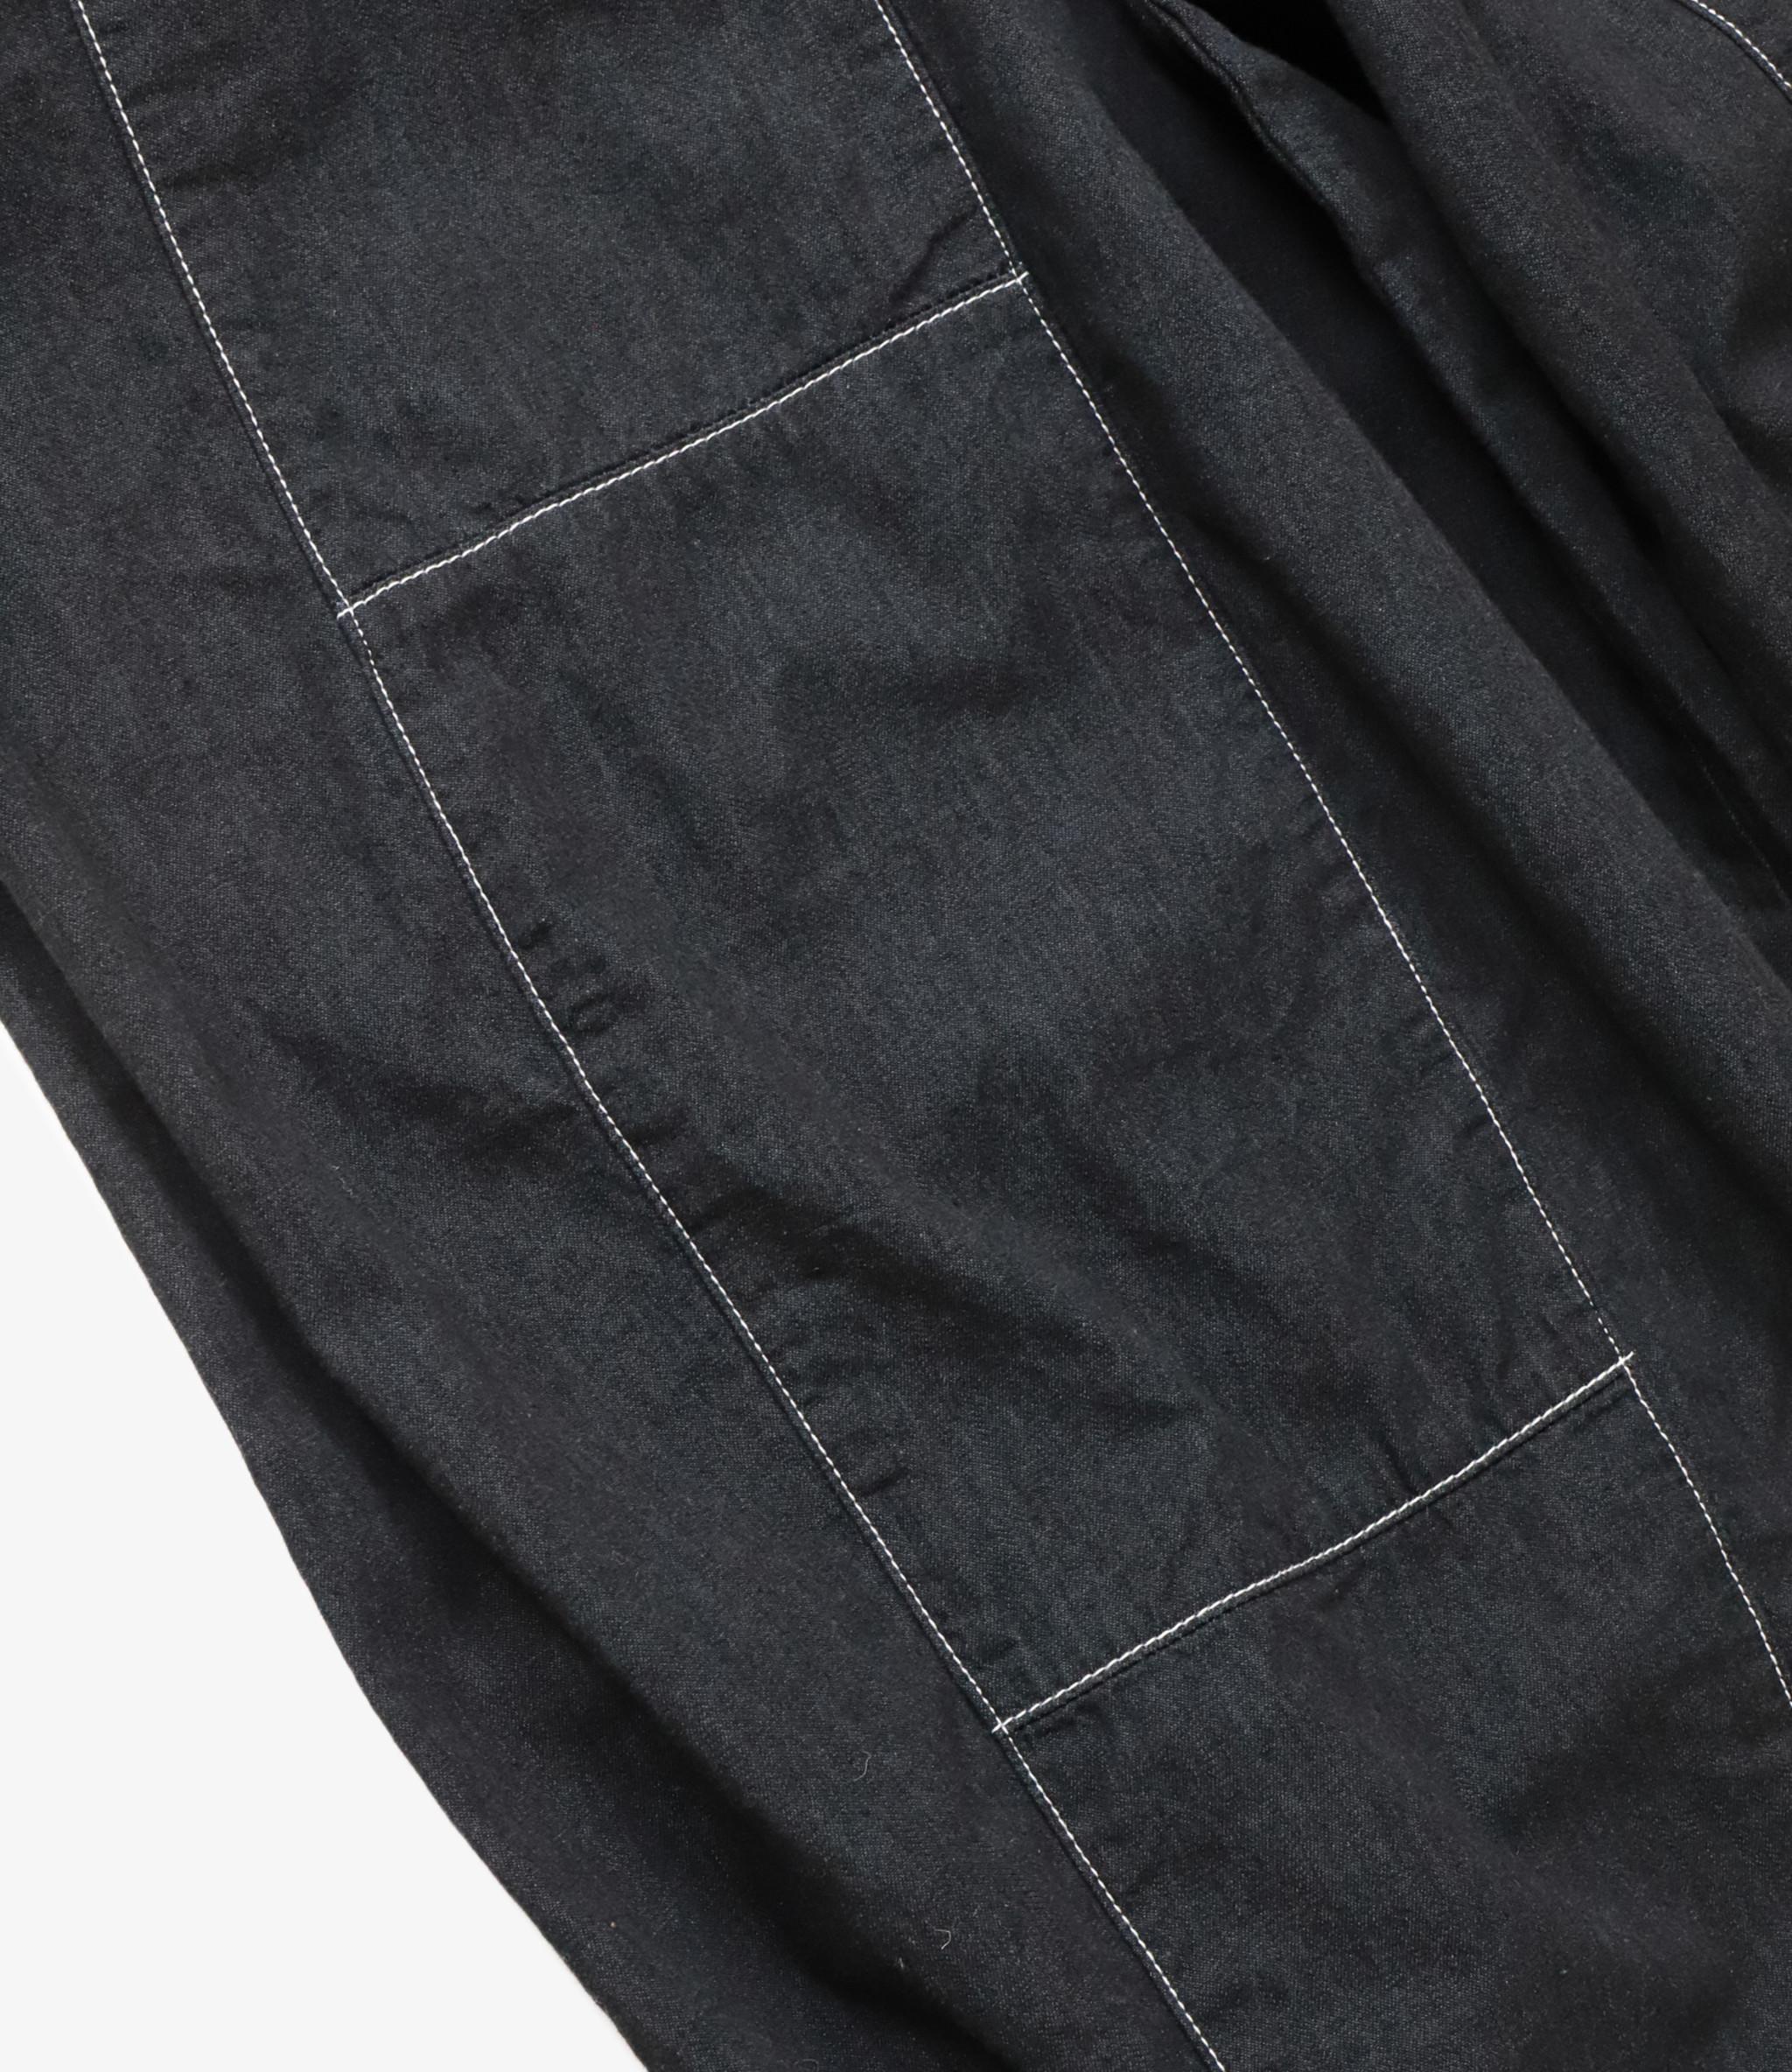 Needles H.D. Pant - 6oz Denim - Black